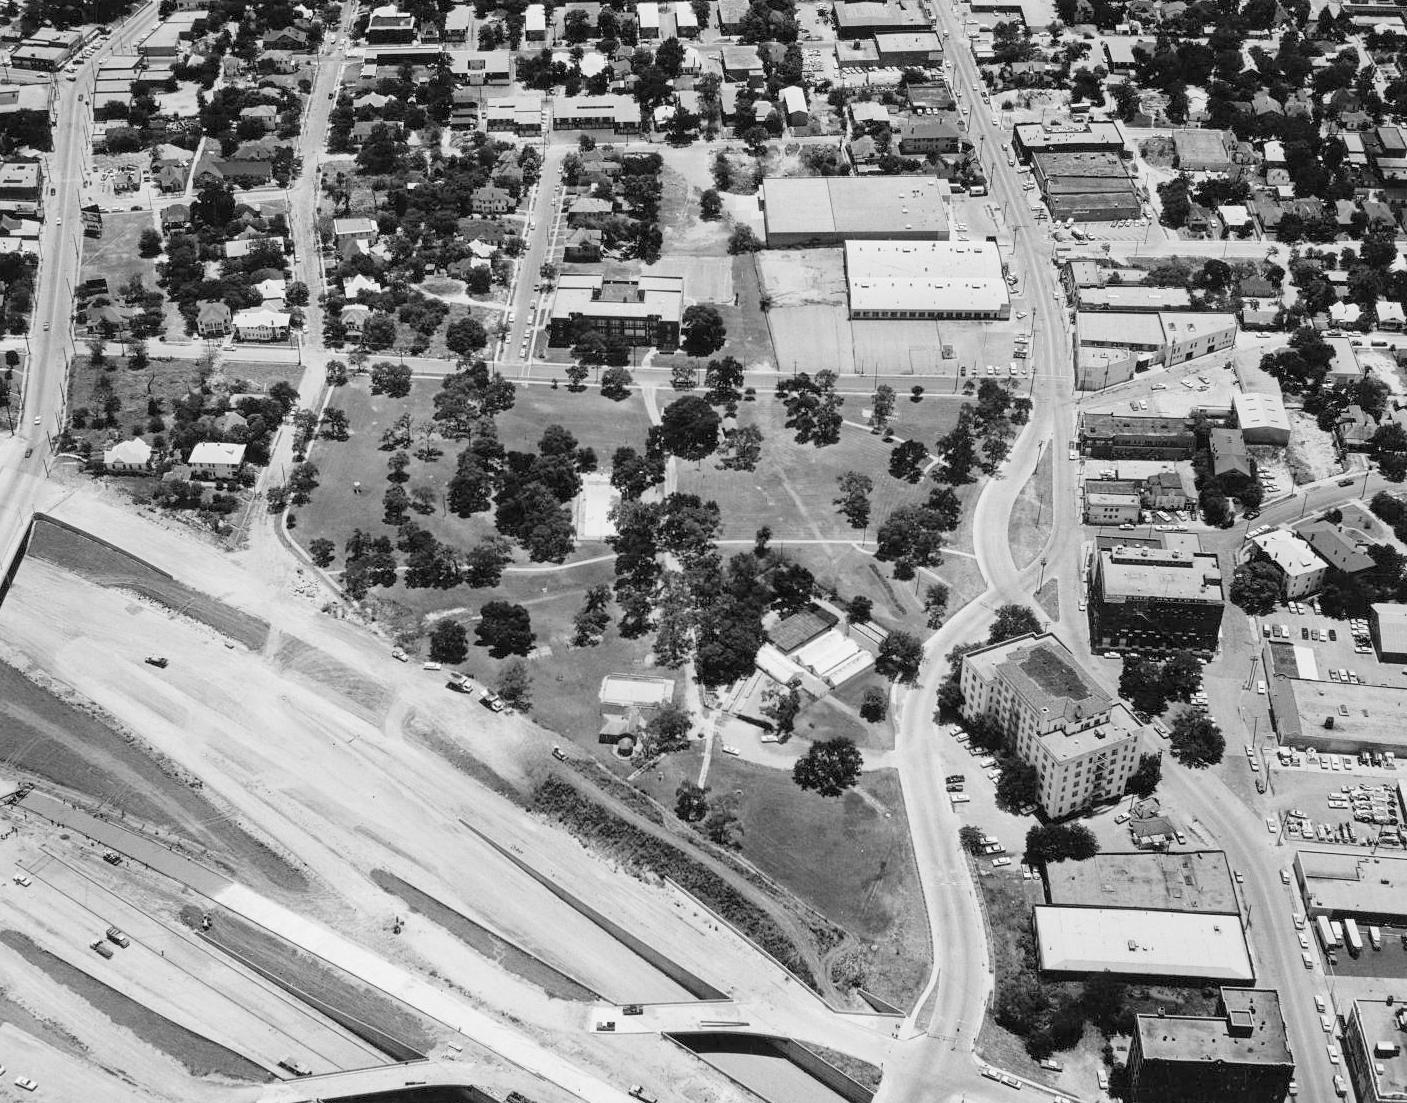 1966_city-park_aerial_squire-haskins_dallas-municipal-archives_portal